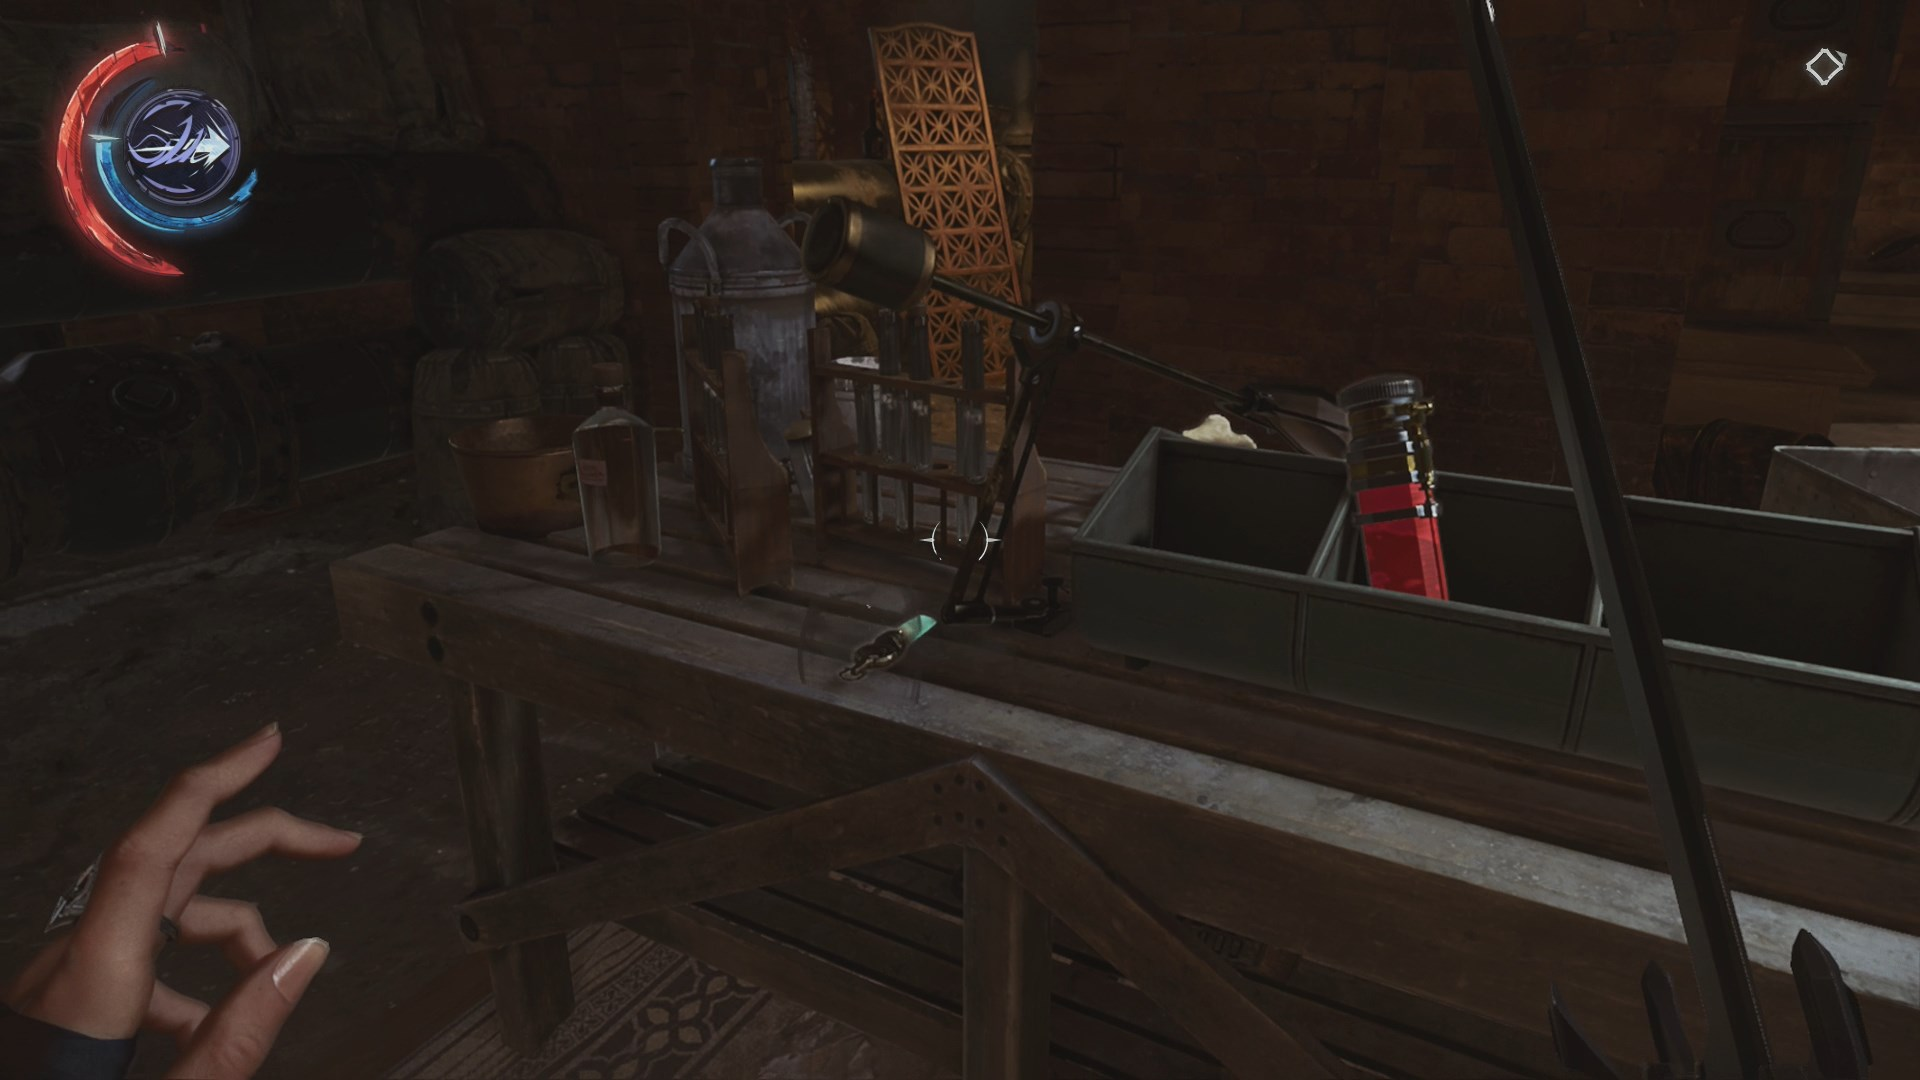 Dishonored 2 Mission 6 Bonecharm #5